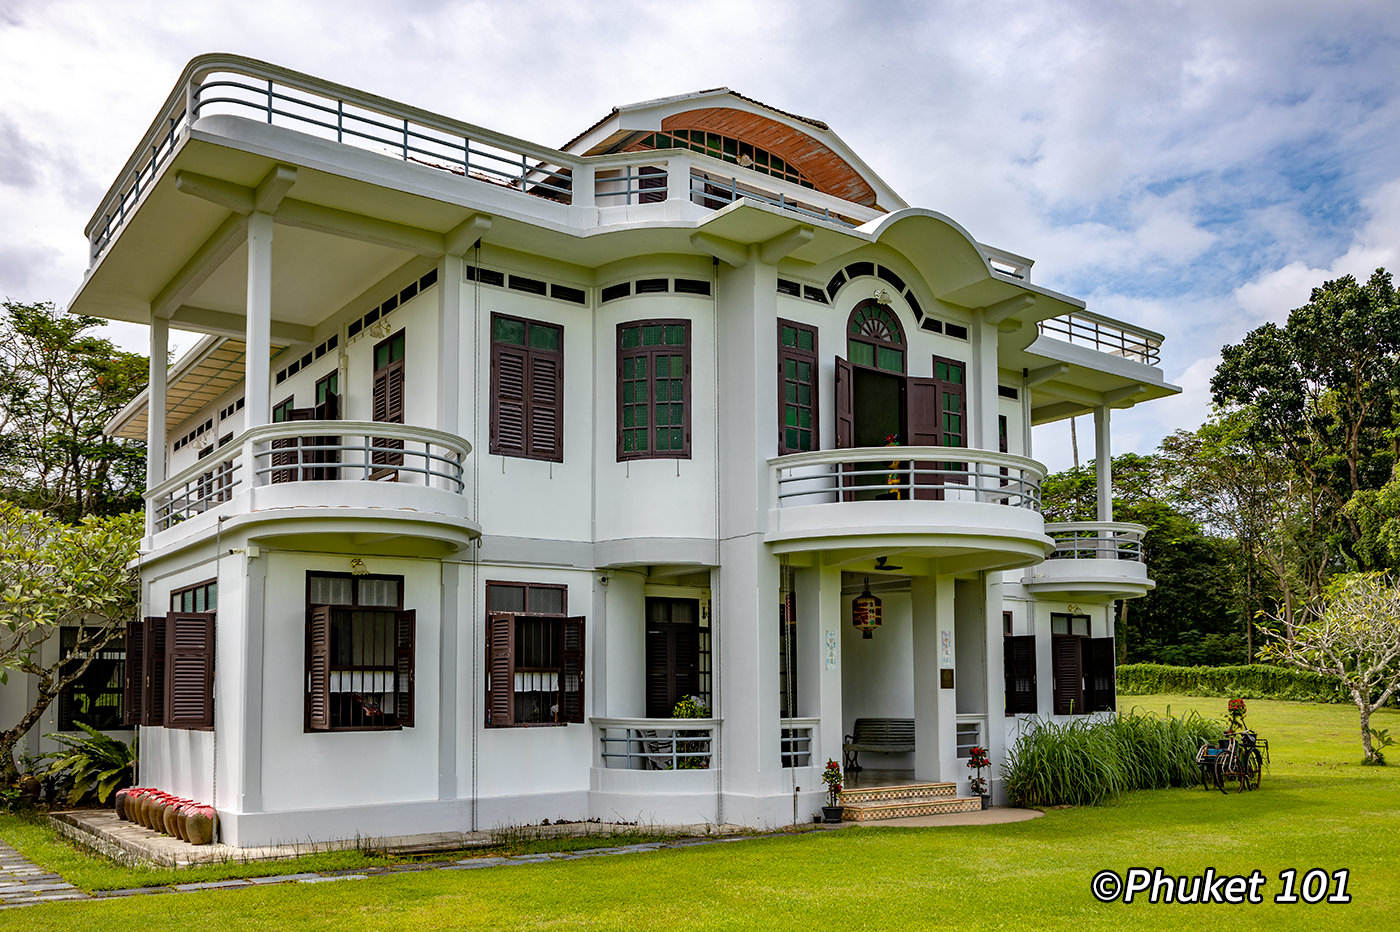 Baan Ar Jor Museum Homestay near Mai Khao Beach